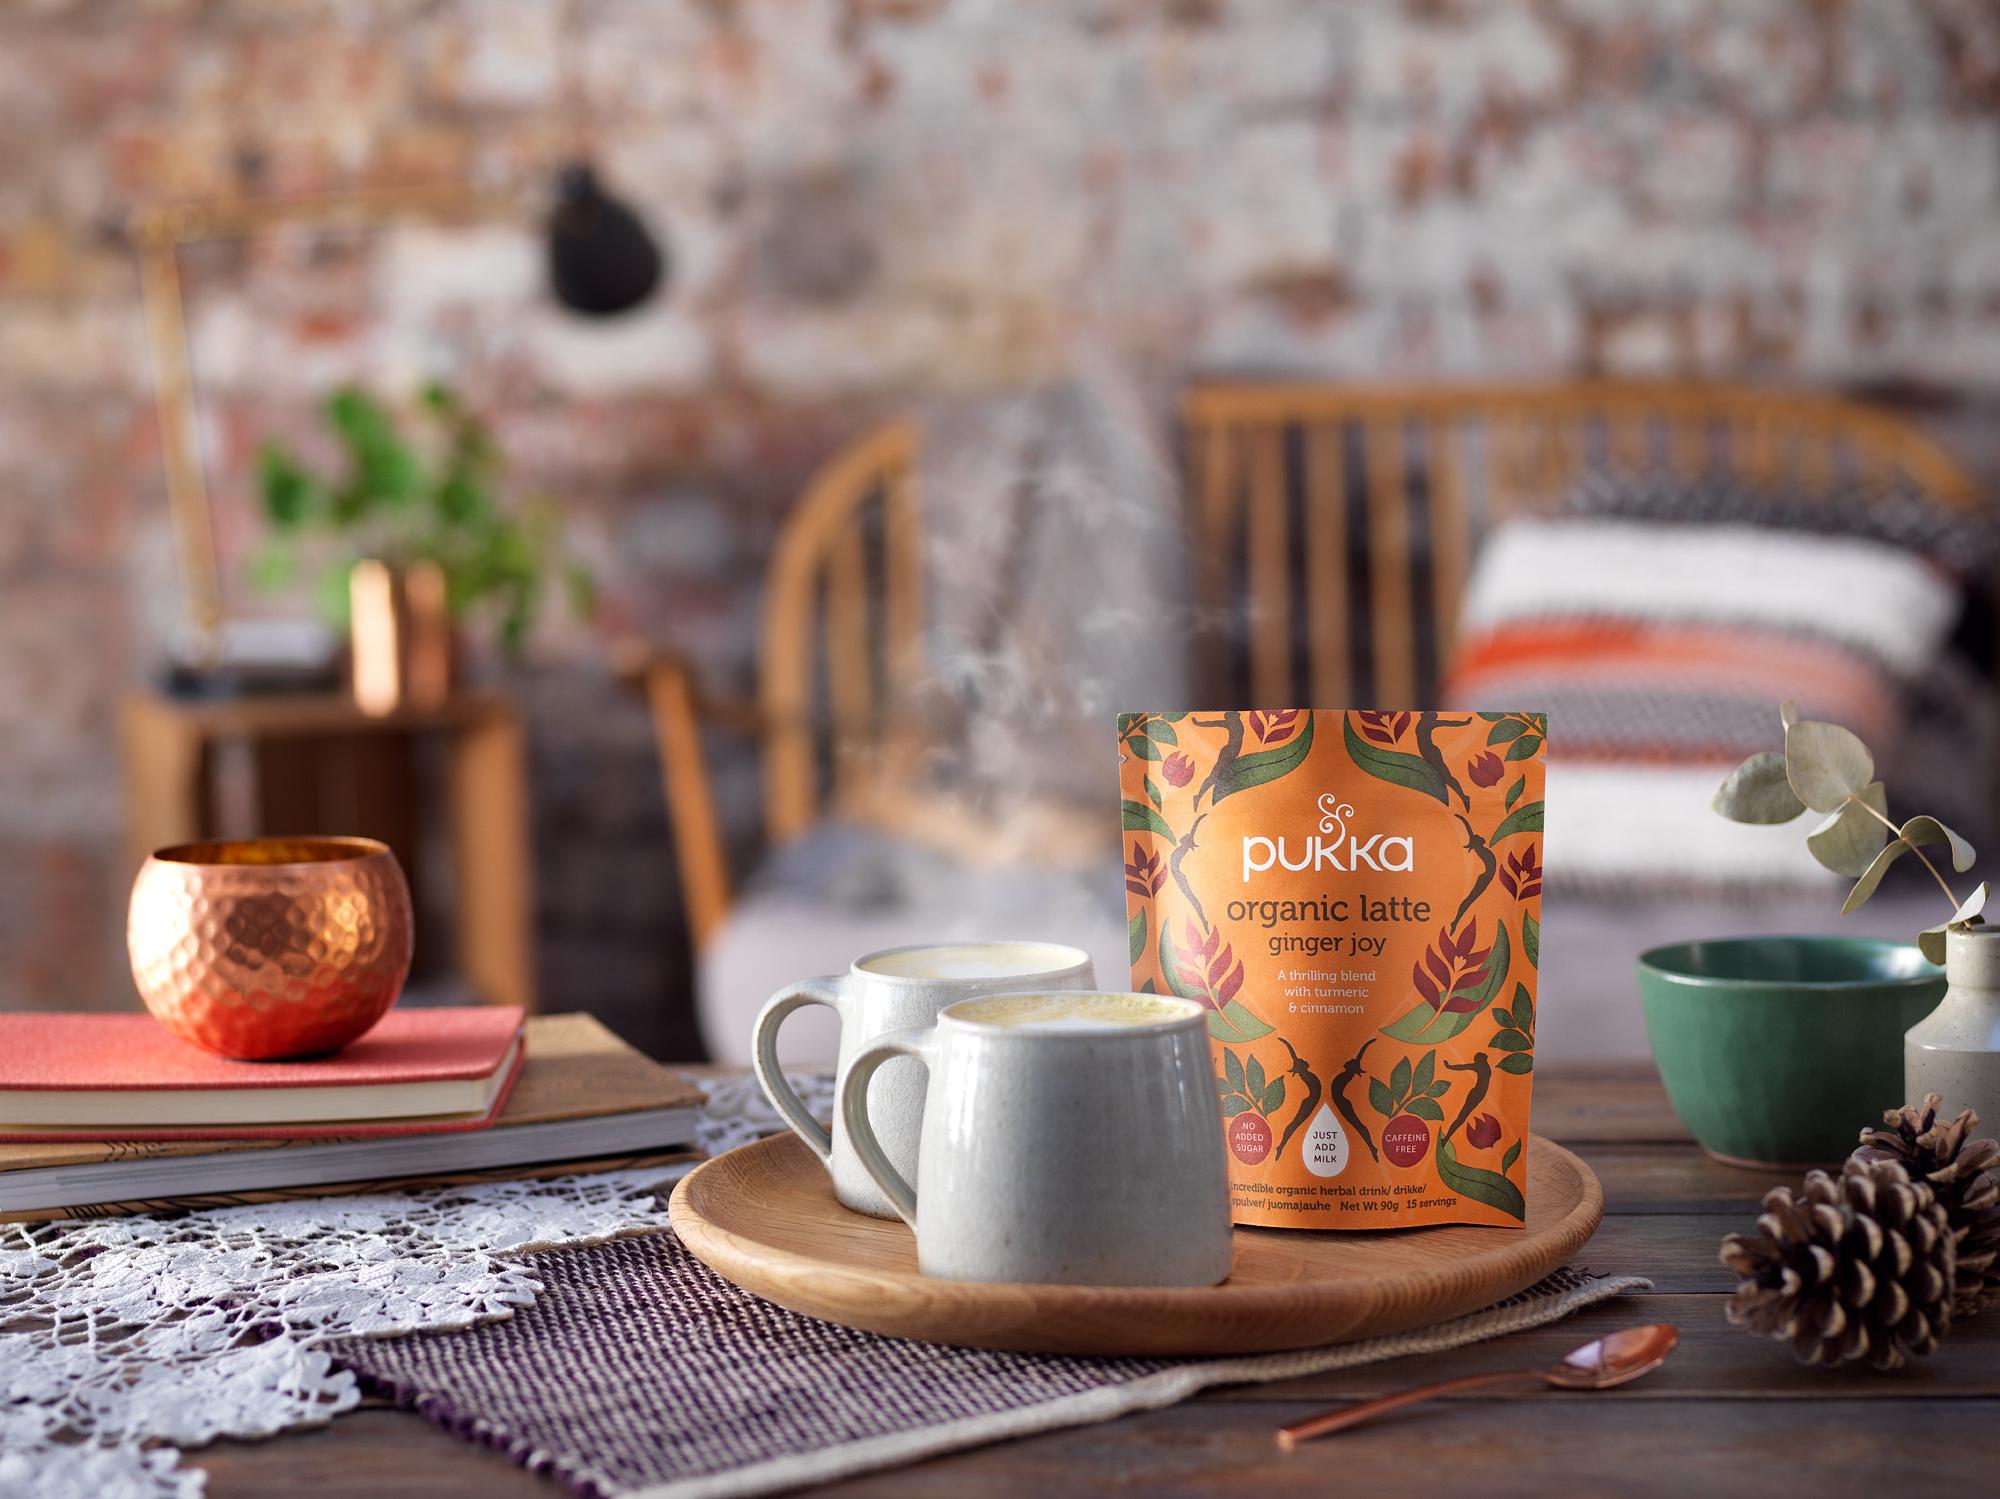 robvanderplank_pukka-latte-gingerjoy-hero-ENG.jpg